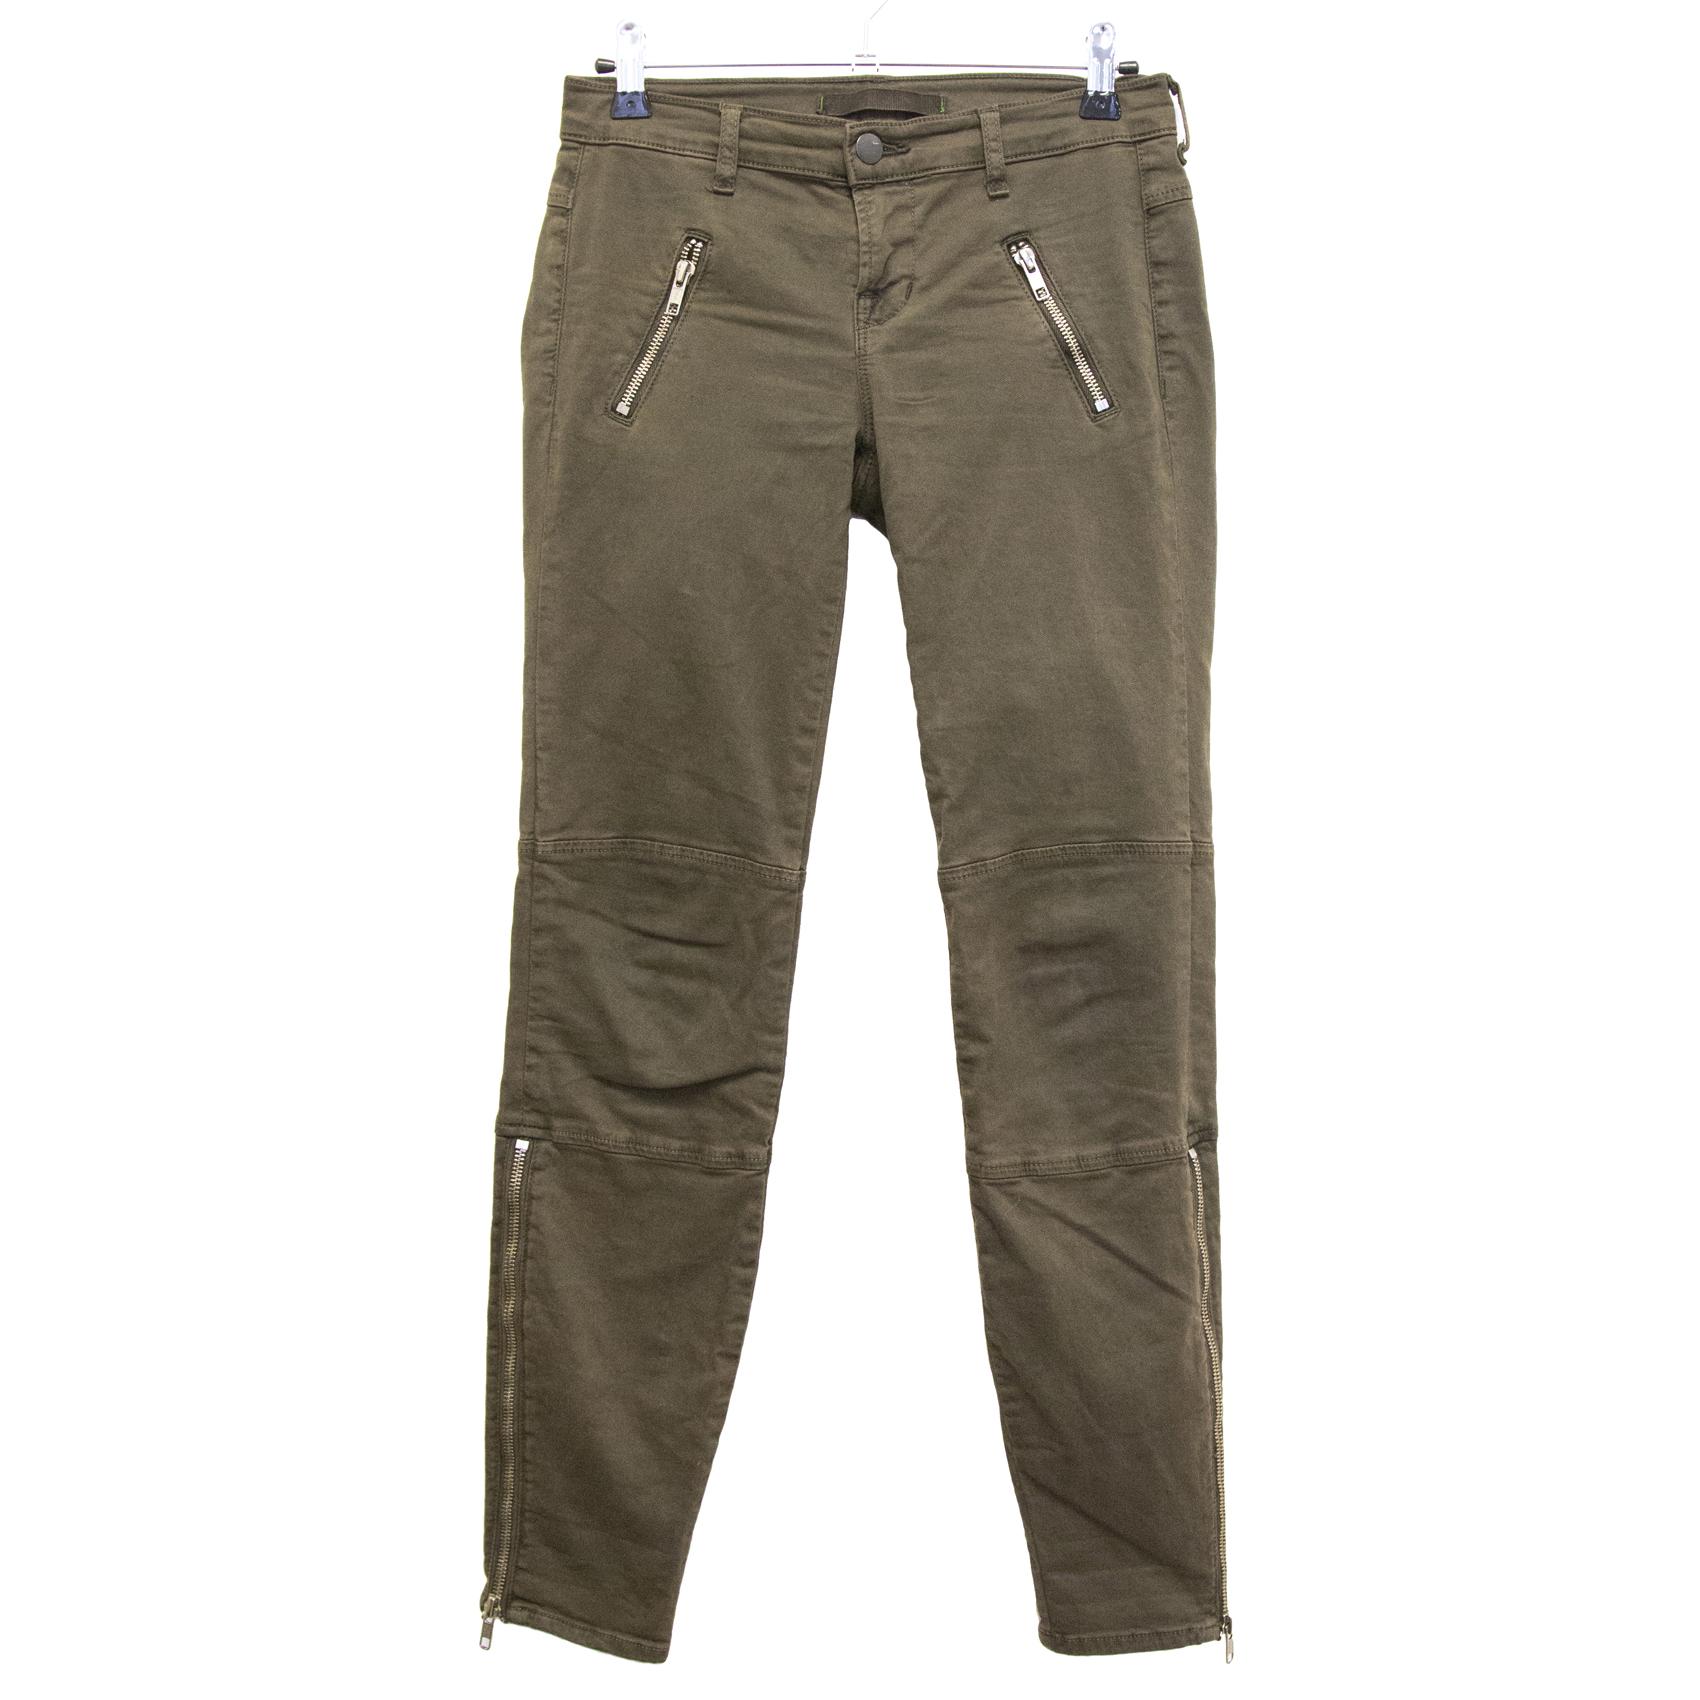 JBrand Khaki Trousers